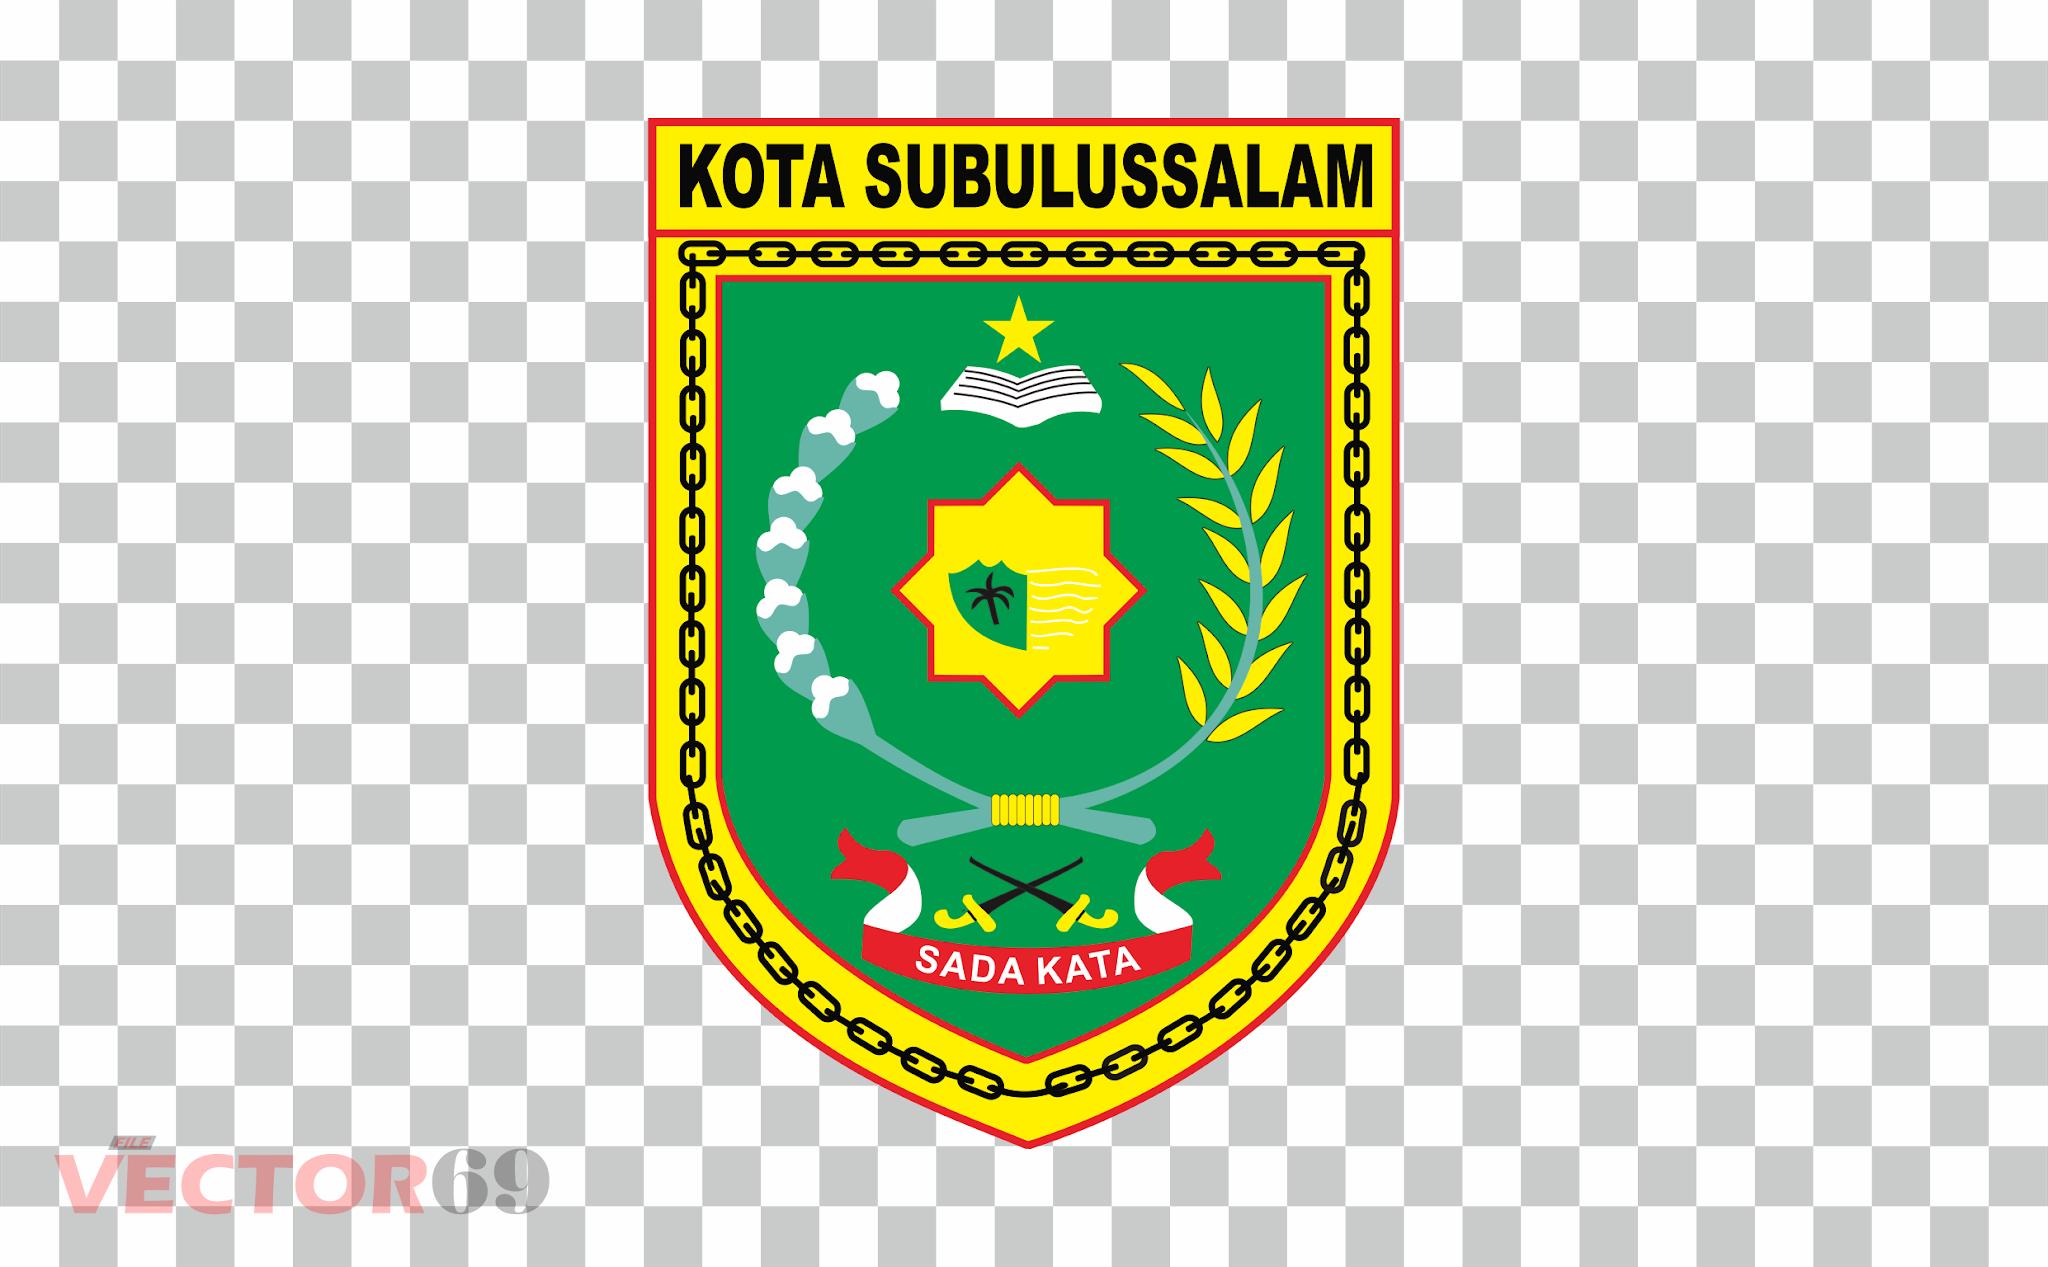 Kota Subulussalam Logo - Download Vector File PNG (Portable Network Graphics)